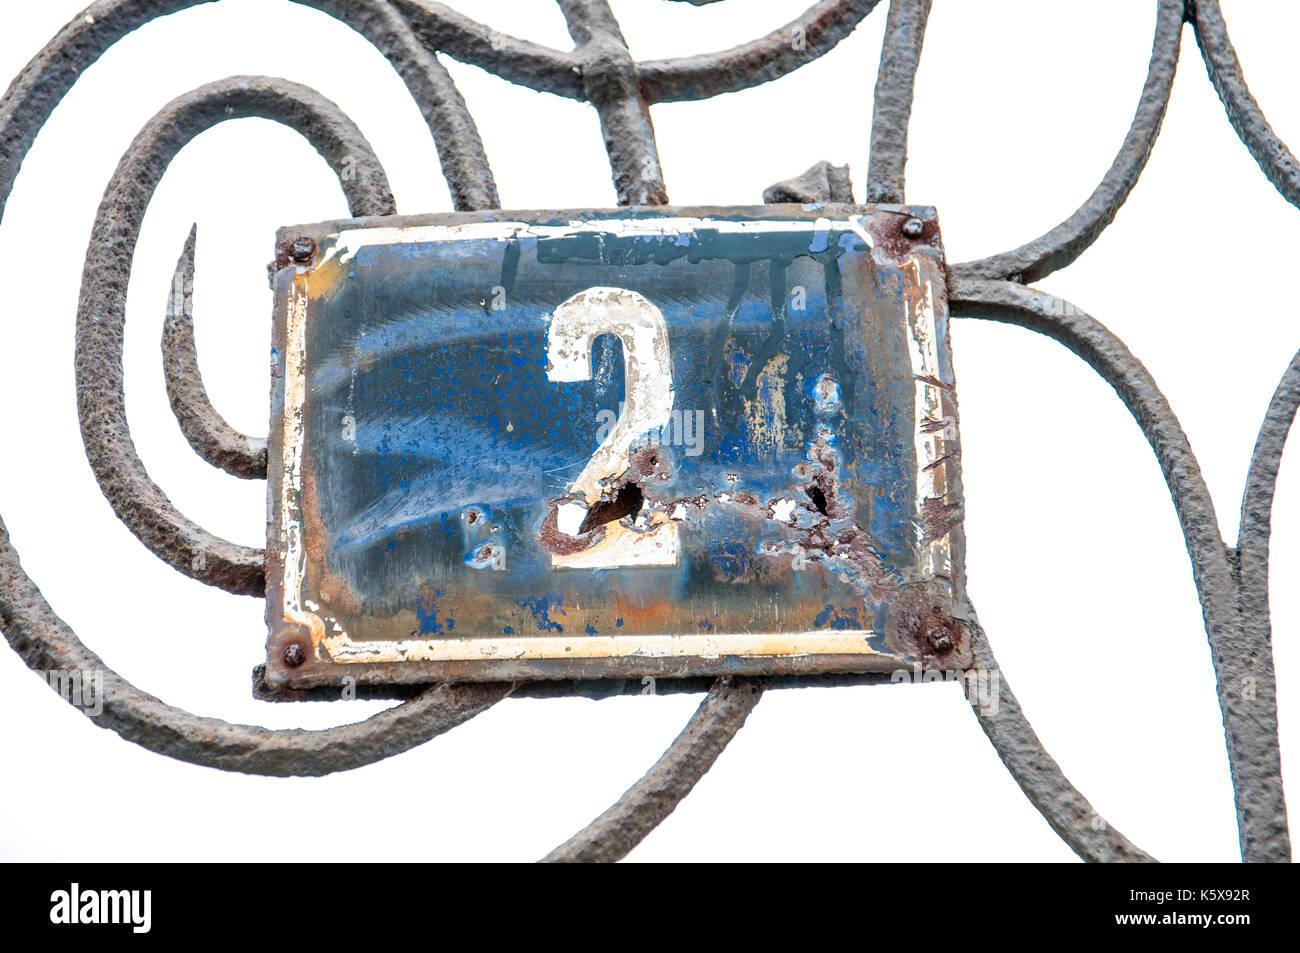 Número de casa Imagen De Stock